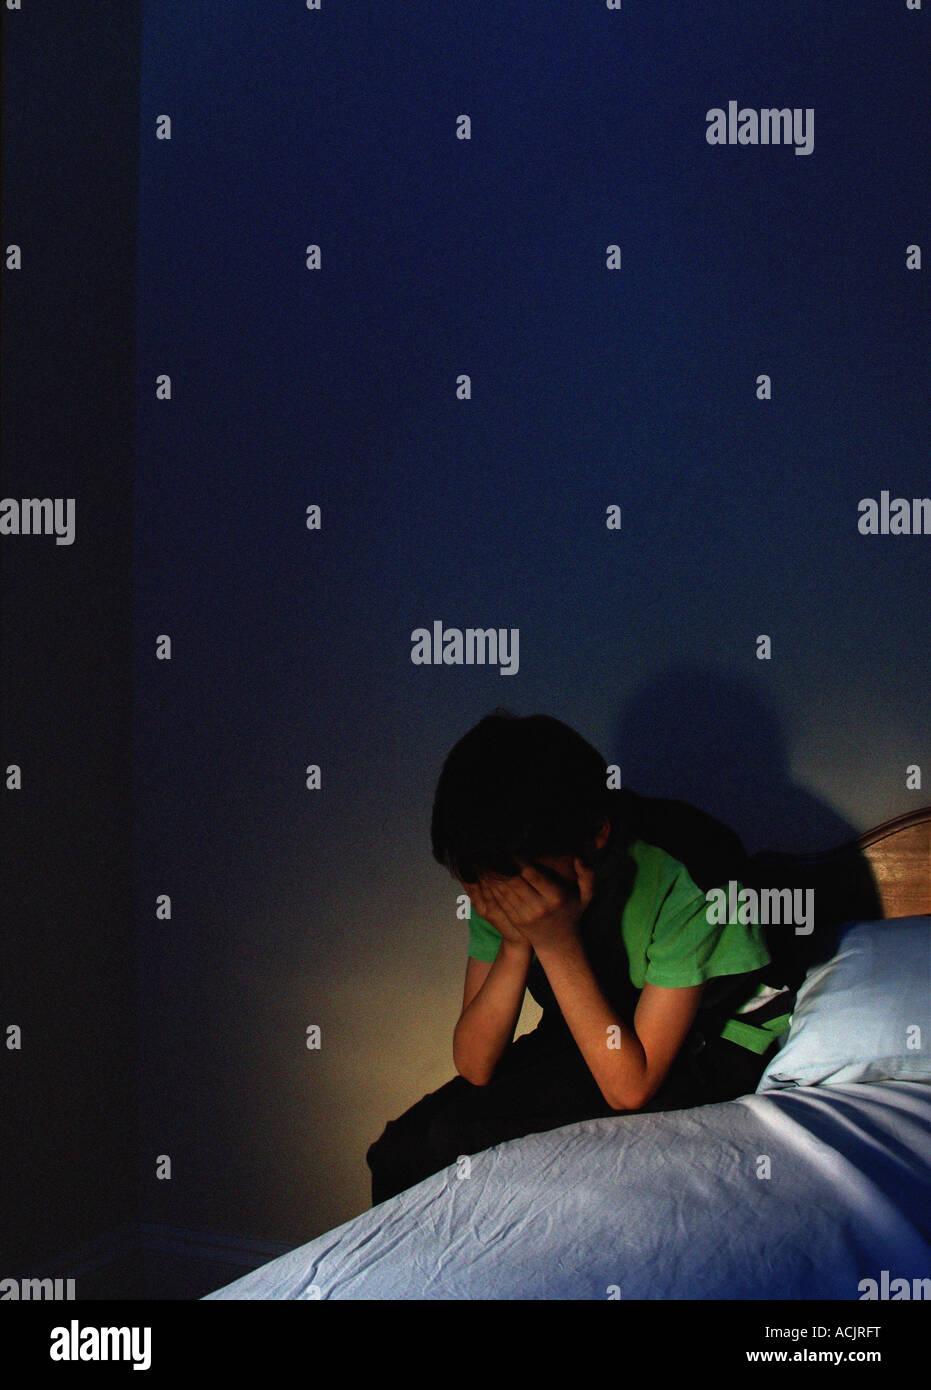 Upset boy alone at night Stock Photo, Royalty Free Image ...